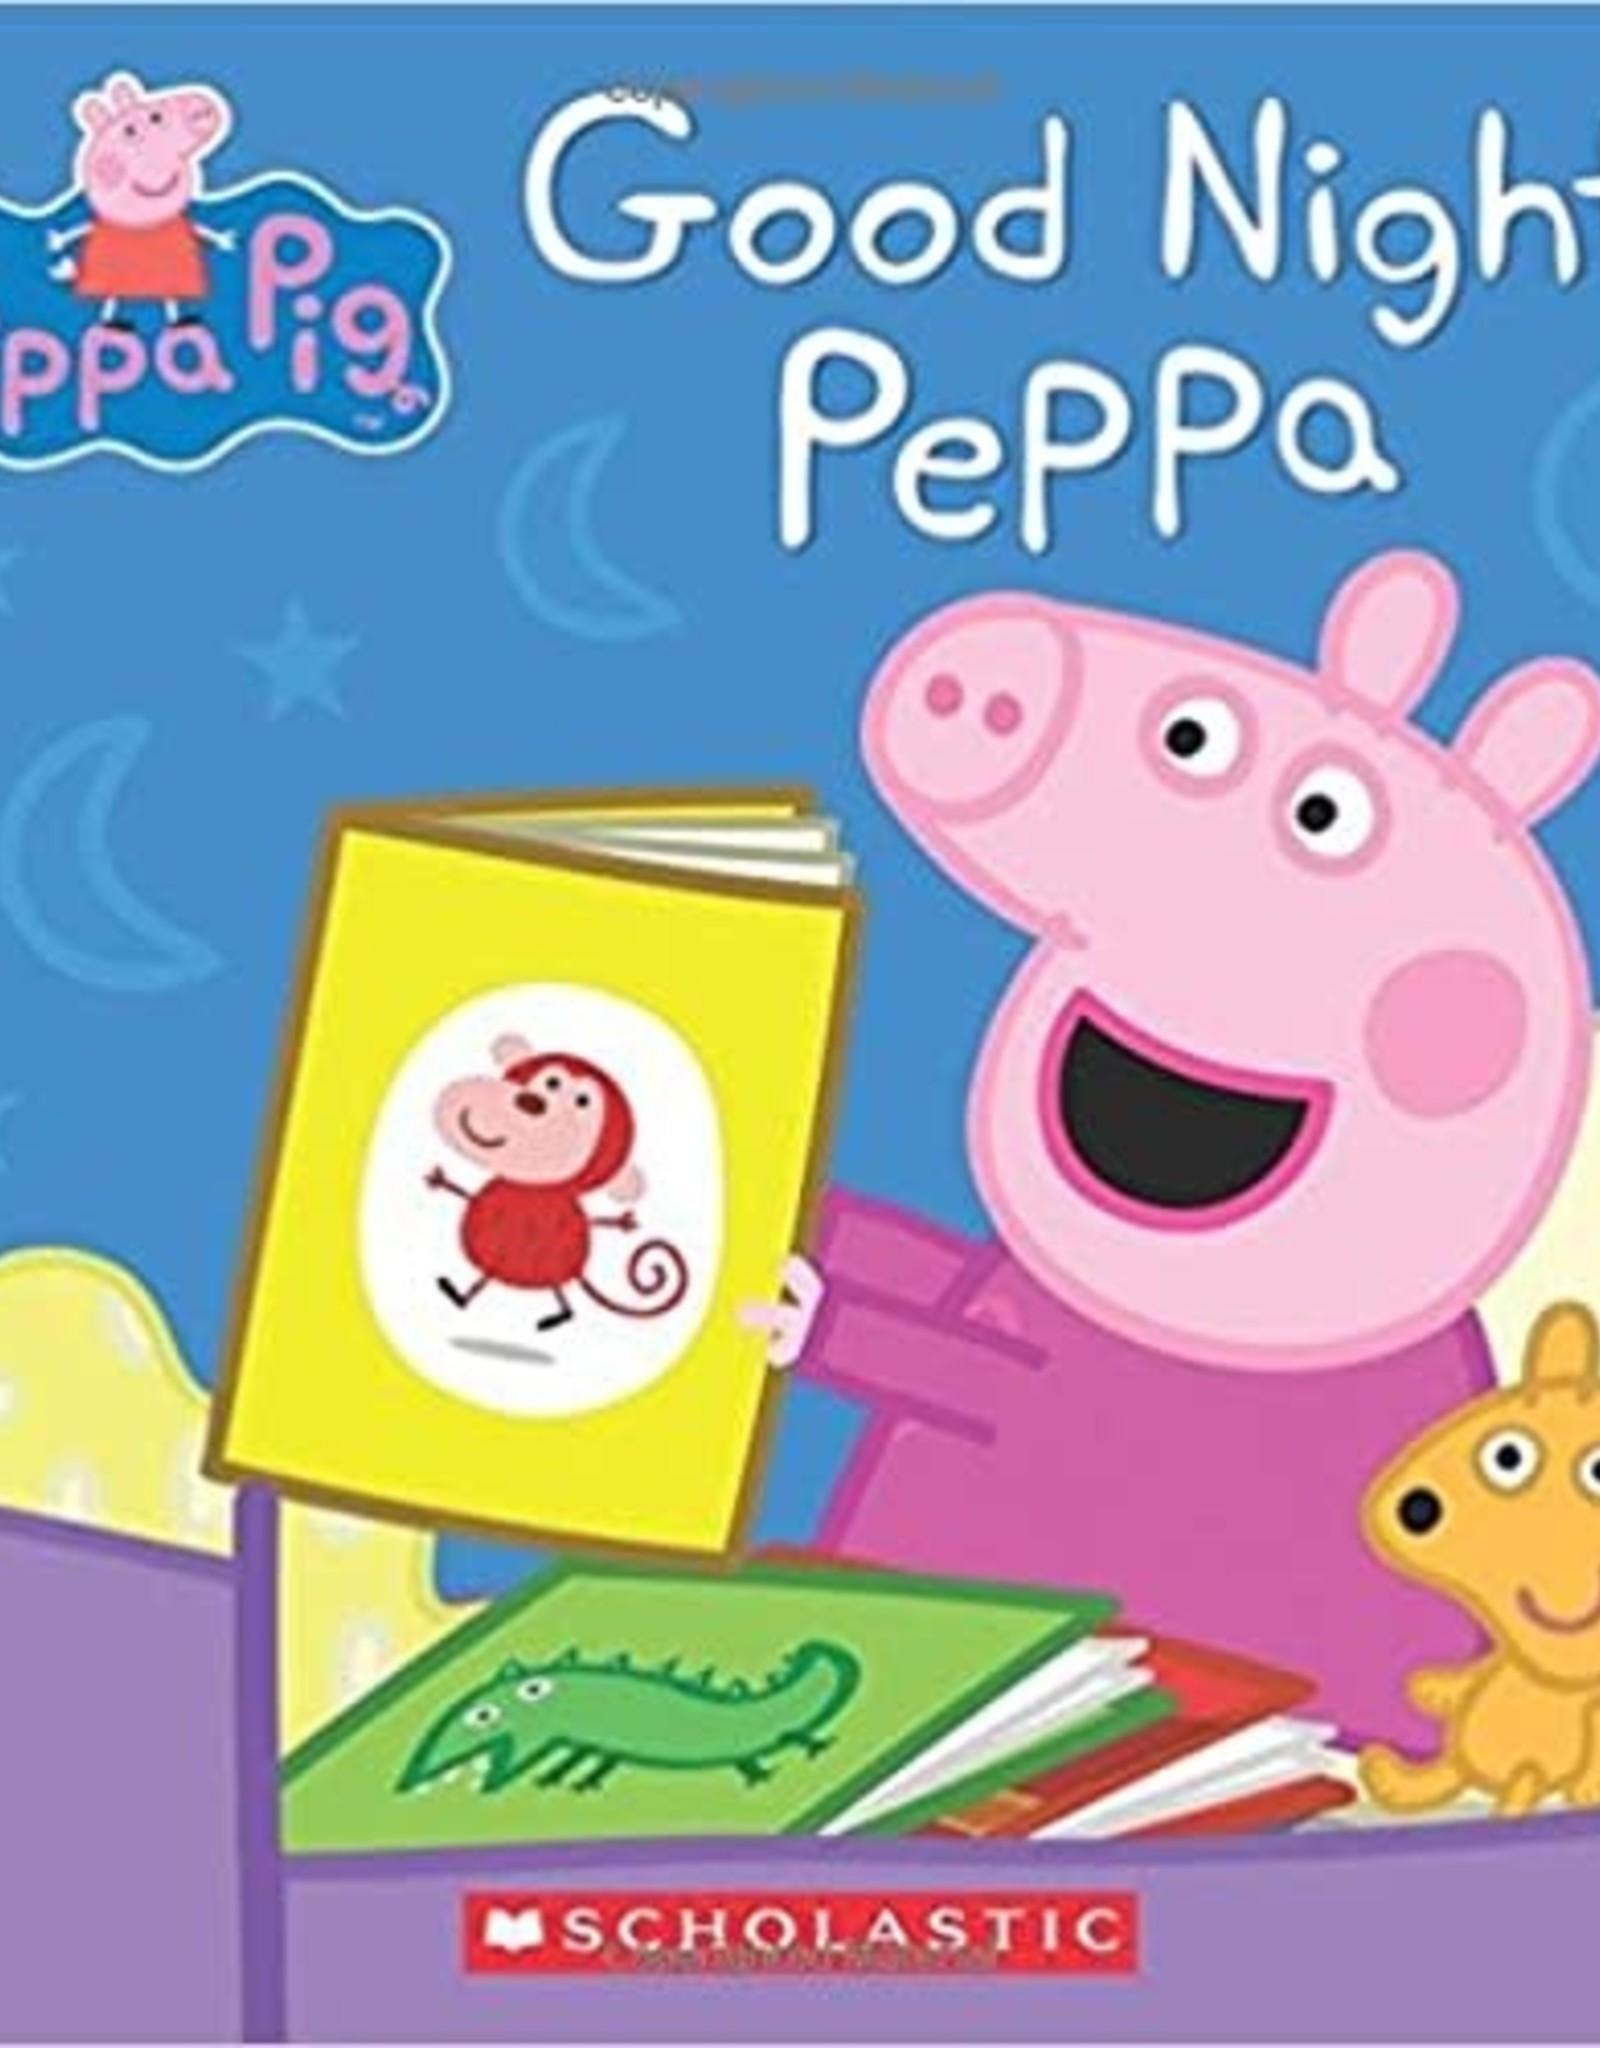 Scholastic Peppa Pig Good Night, Peppa